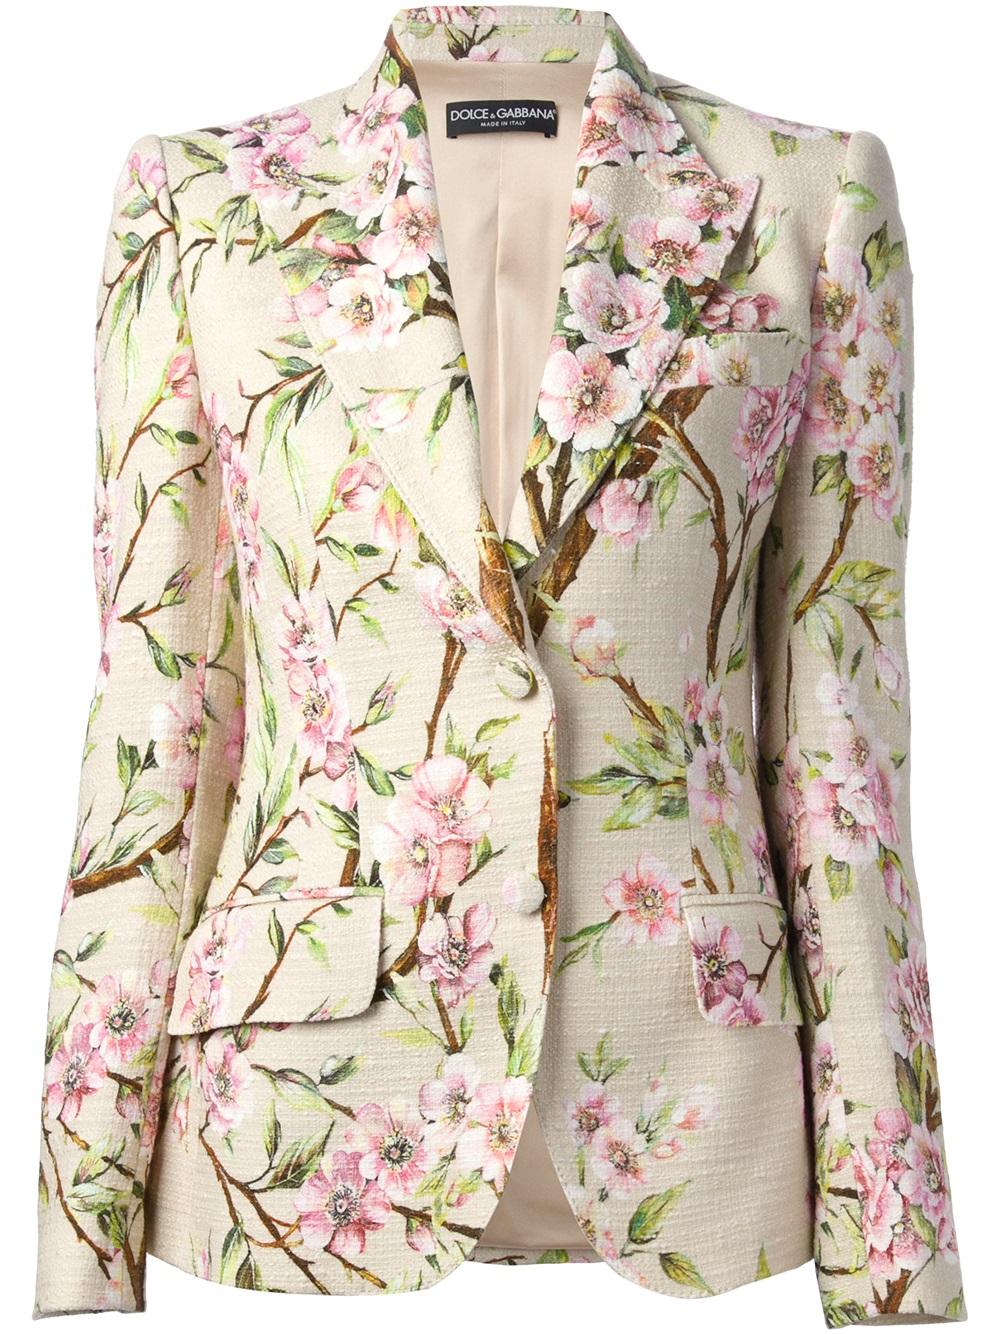 c62e6b3bdfa Dolce & Gabbana Floral Print Blazer in Natural - Lyst